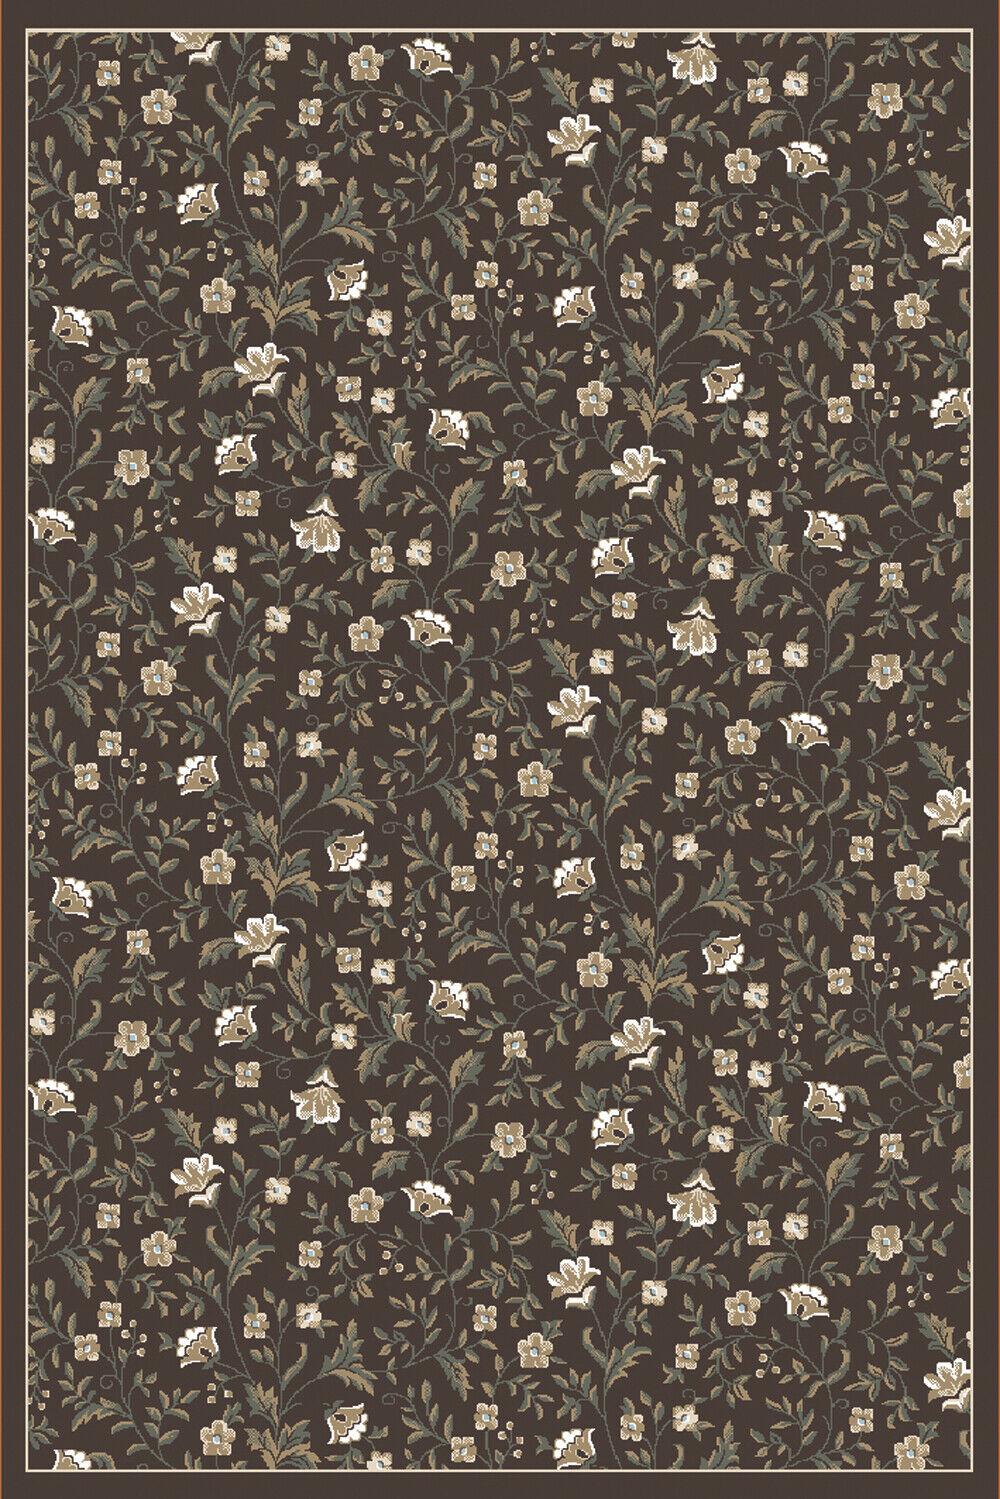 3x5 Radici Marronee Borderosso Leaves Vines Area Rug 6674 - Aprx 3' 3  x 4' 11